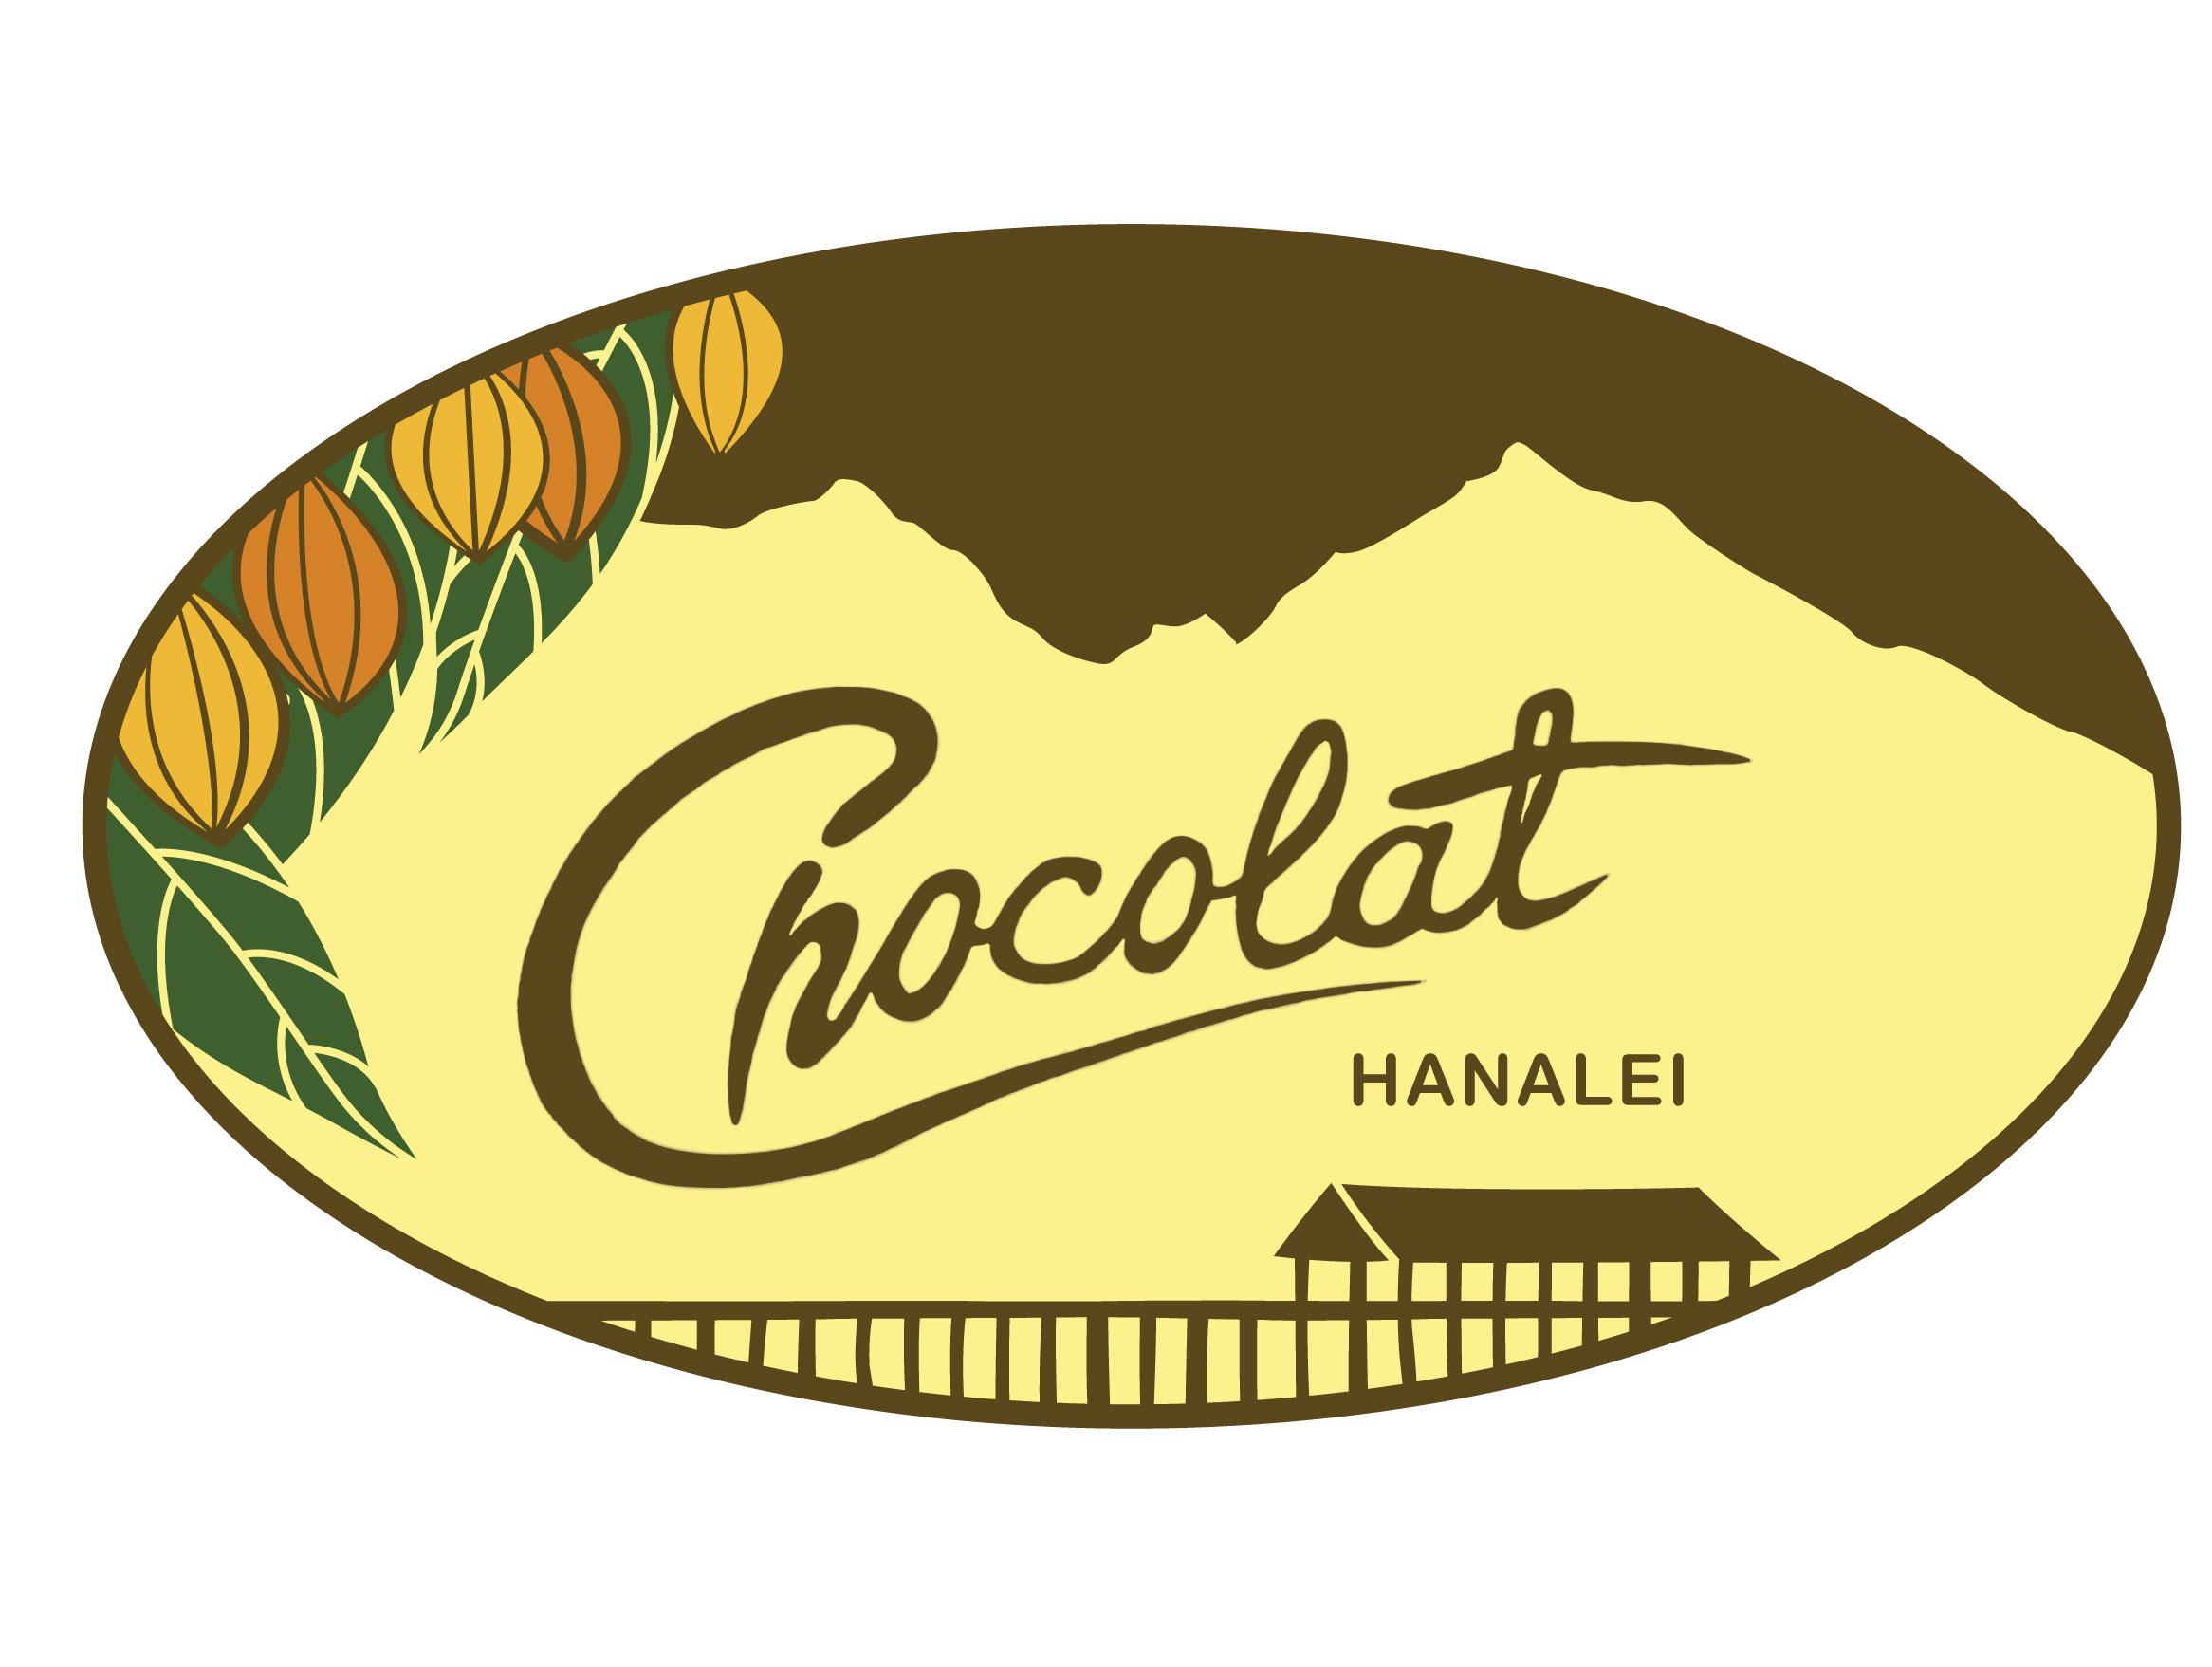 Chocolat Hanalei